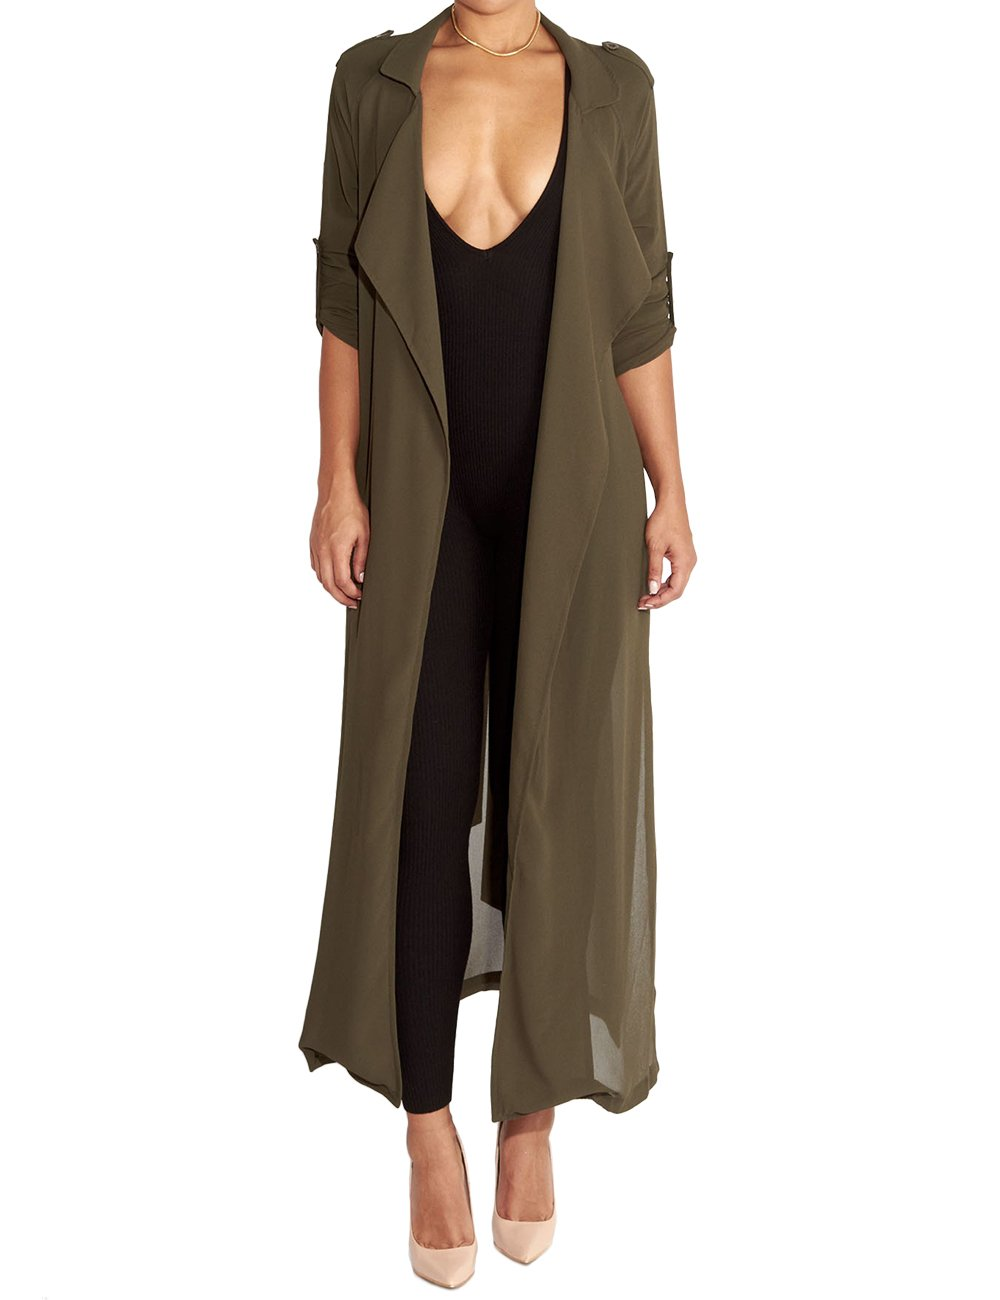 Begonia.K Women's Long Sleeve Chiffon Lightweight Maxi Sheer Duster Cardigan, Army Green, Small